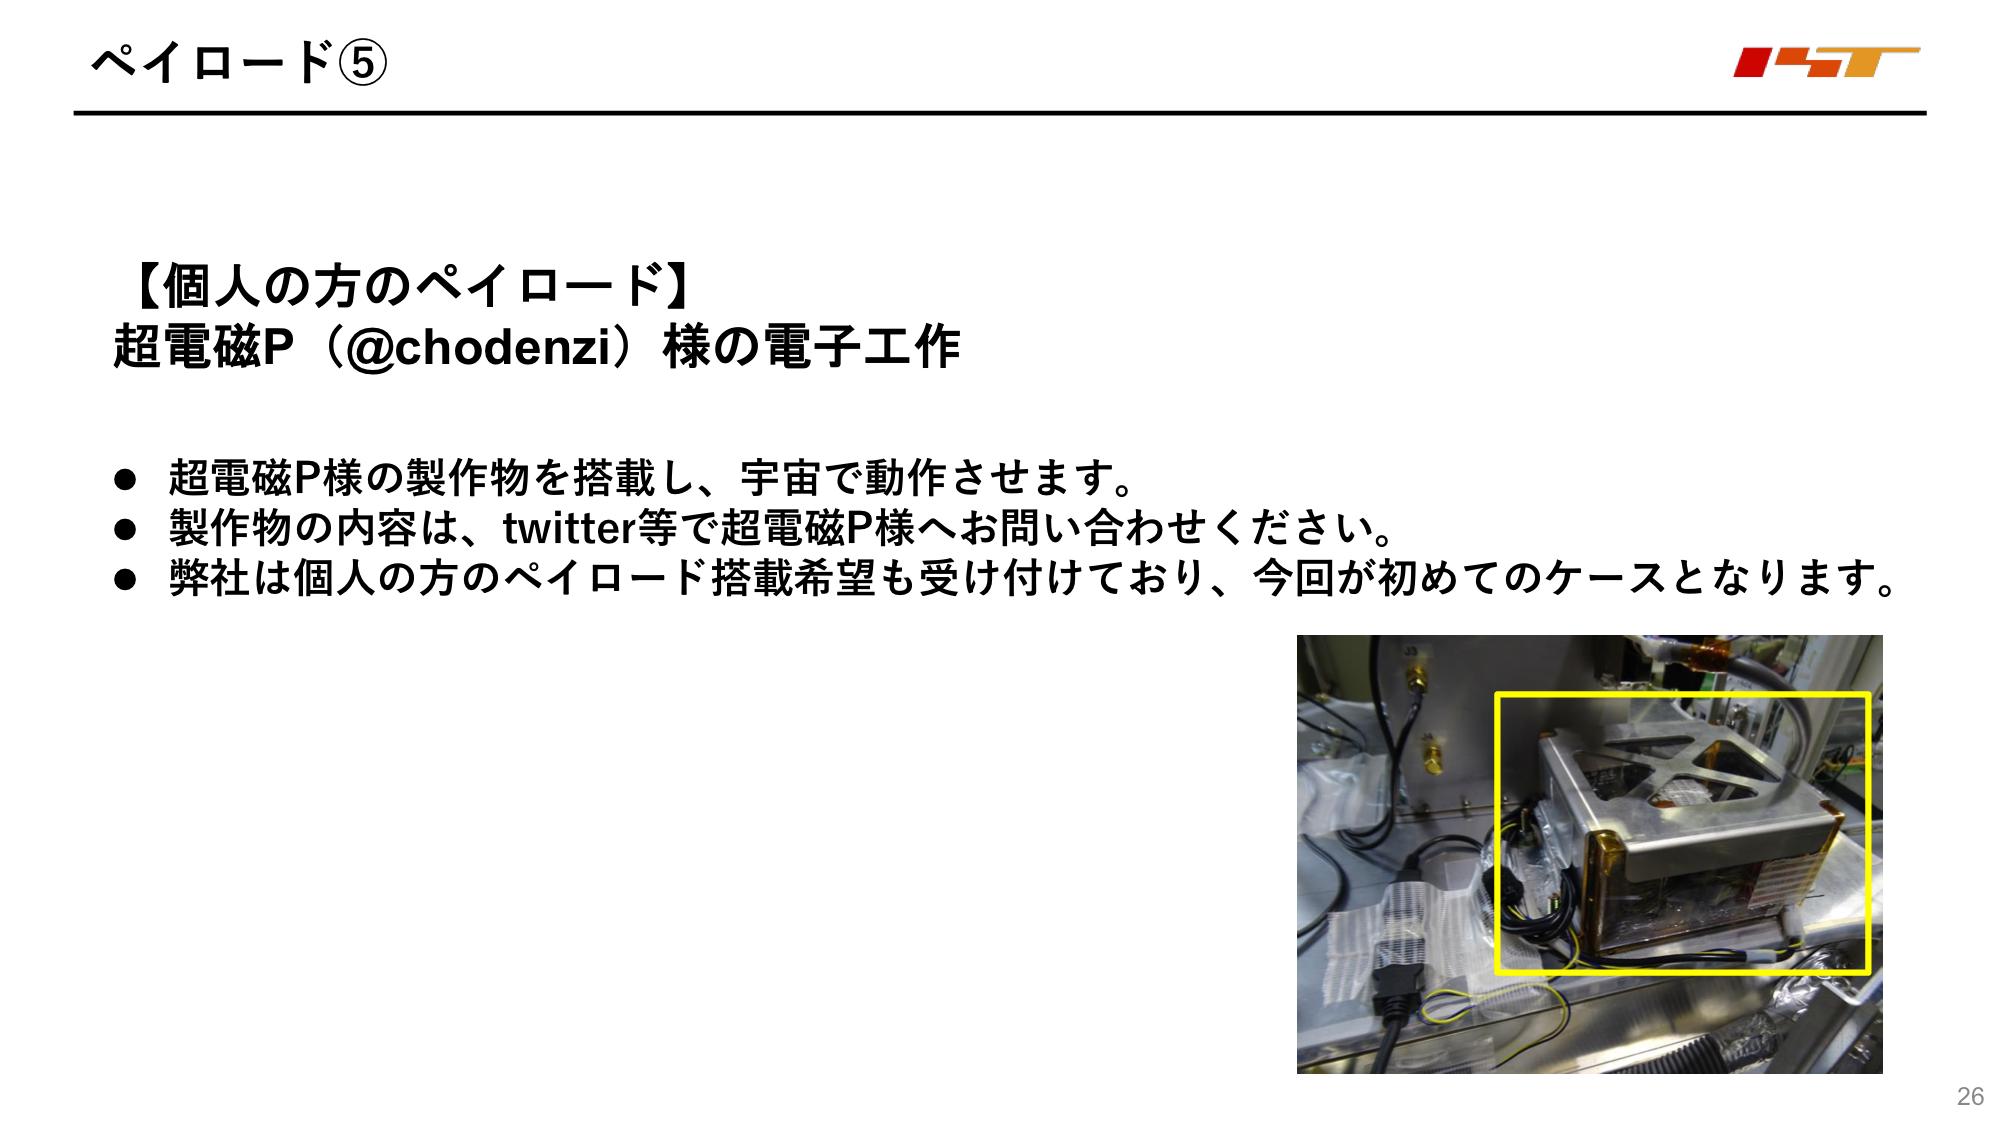 f:id:Imamura:20191126135242p:plain